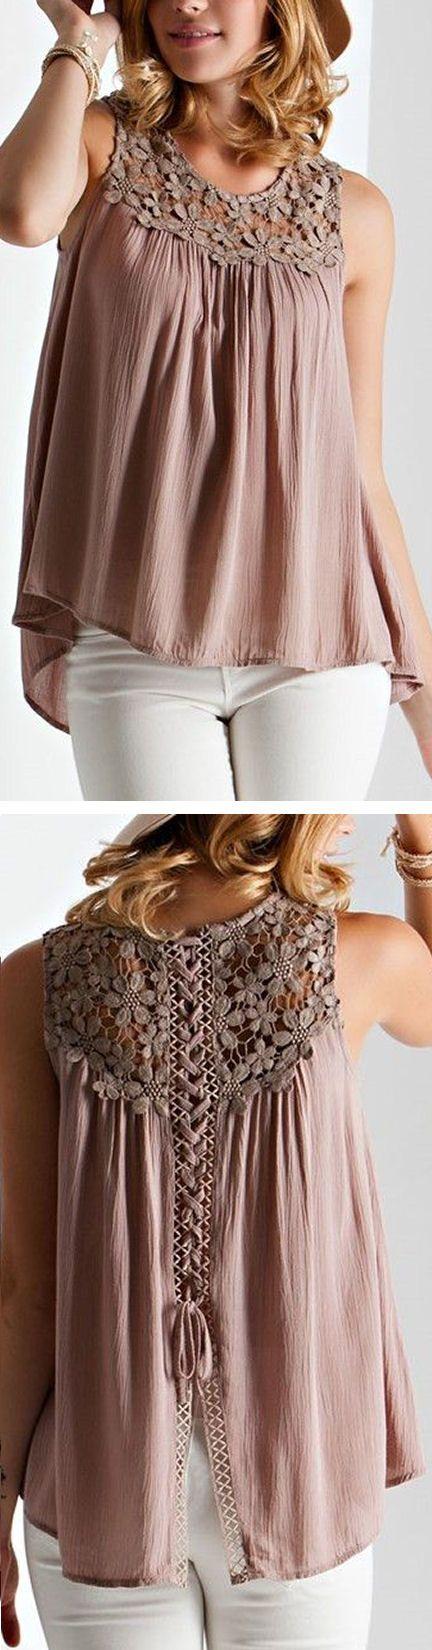 Crochet Lace Tank ❤︎                                                                                                                                                      Más